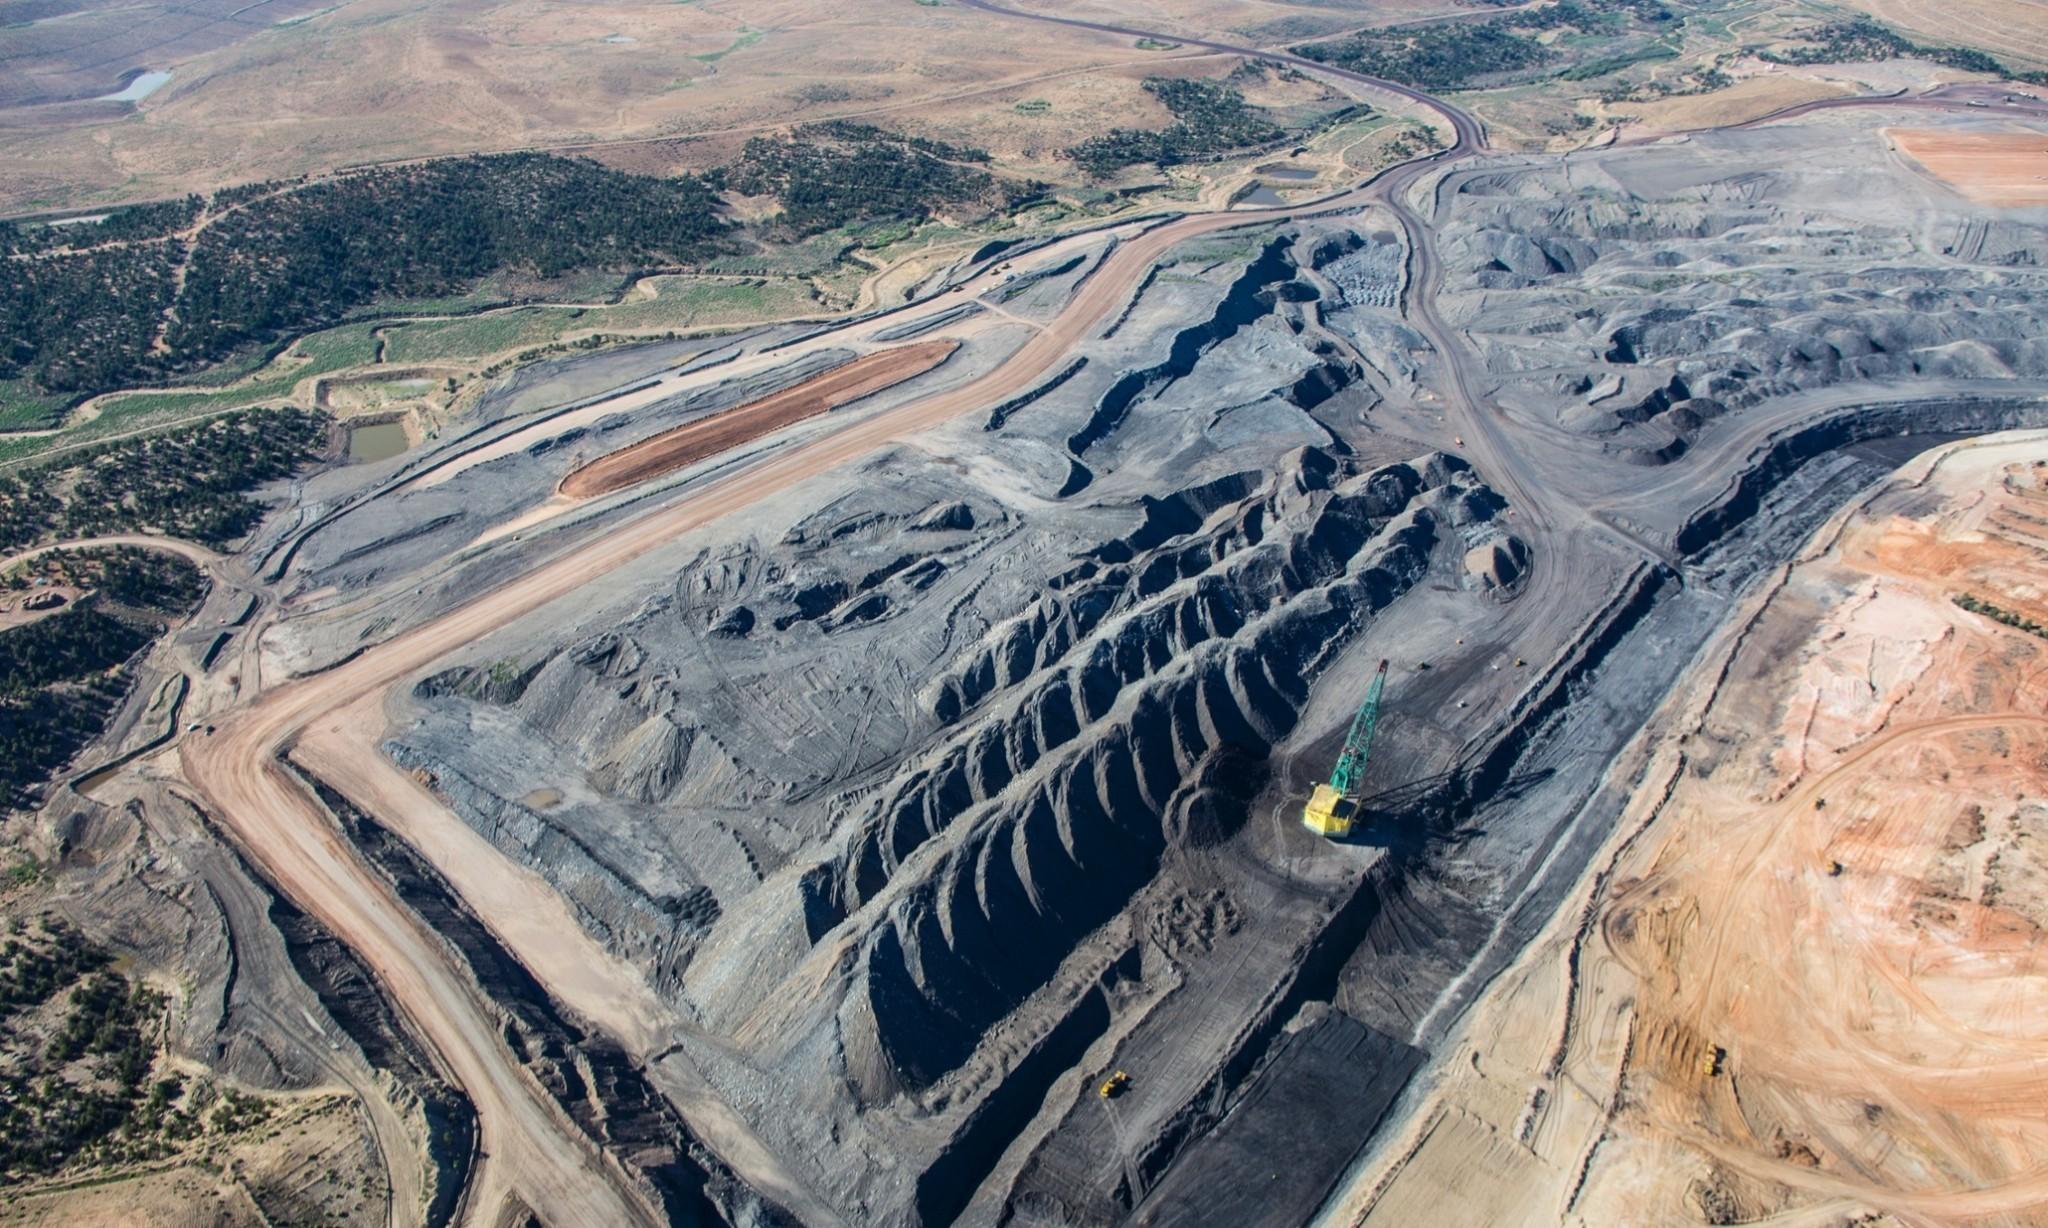 Black Mesa mines: Native Americans demand return of their ancestors' bones